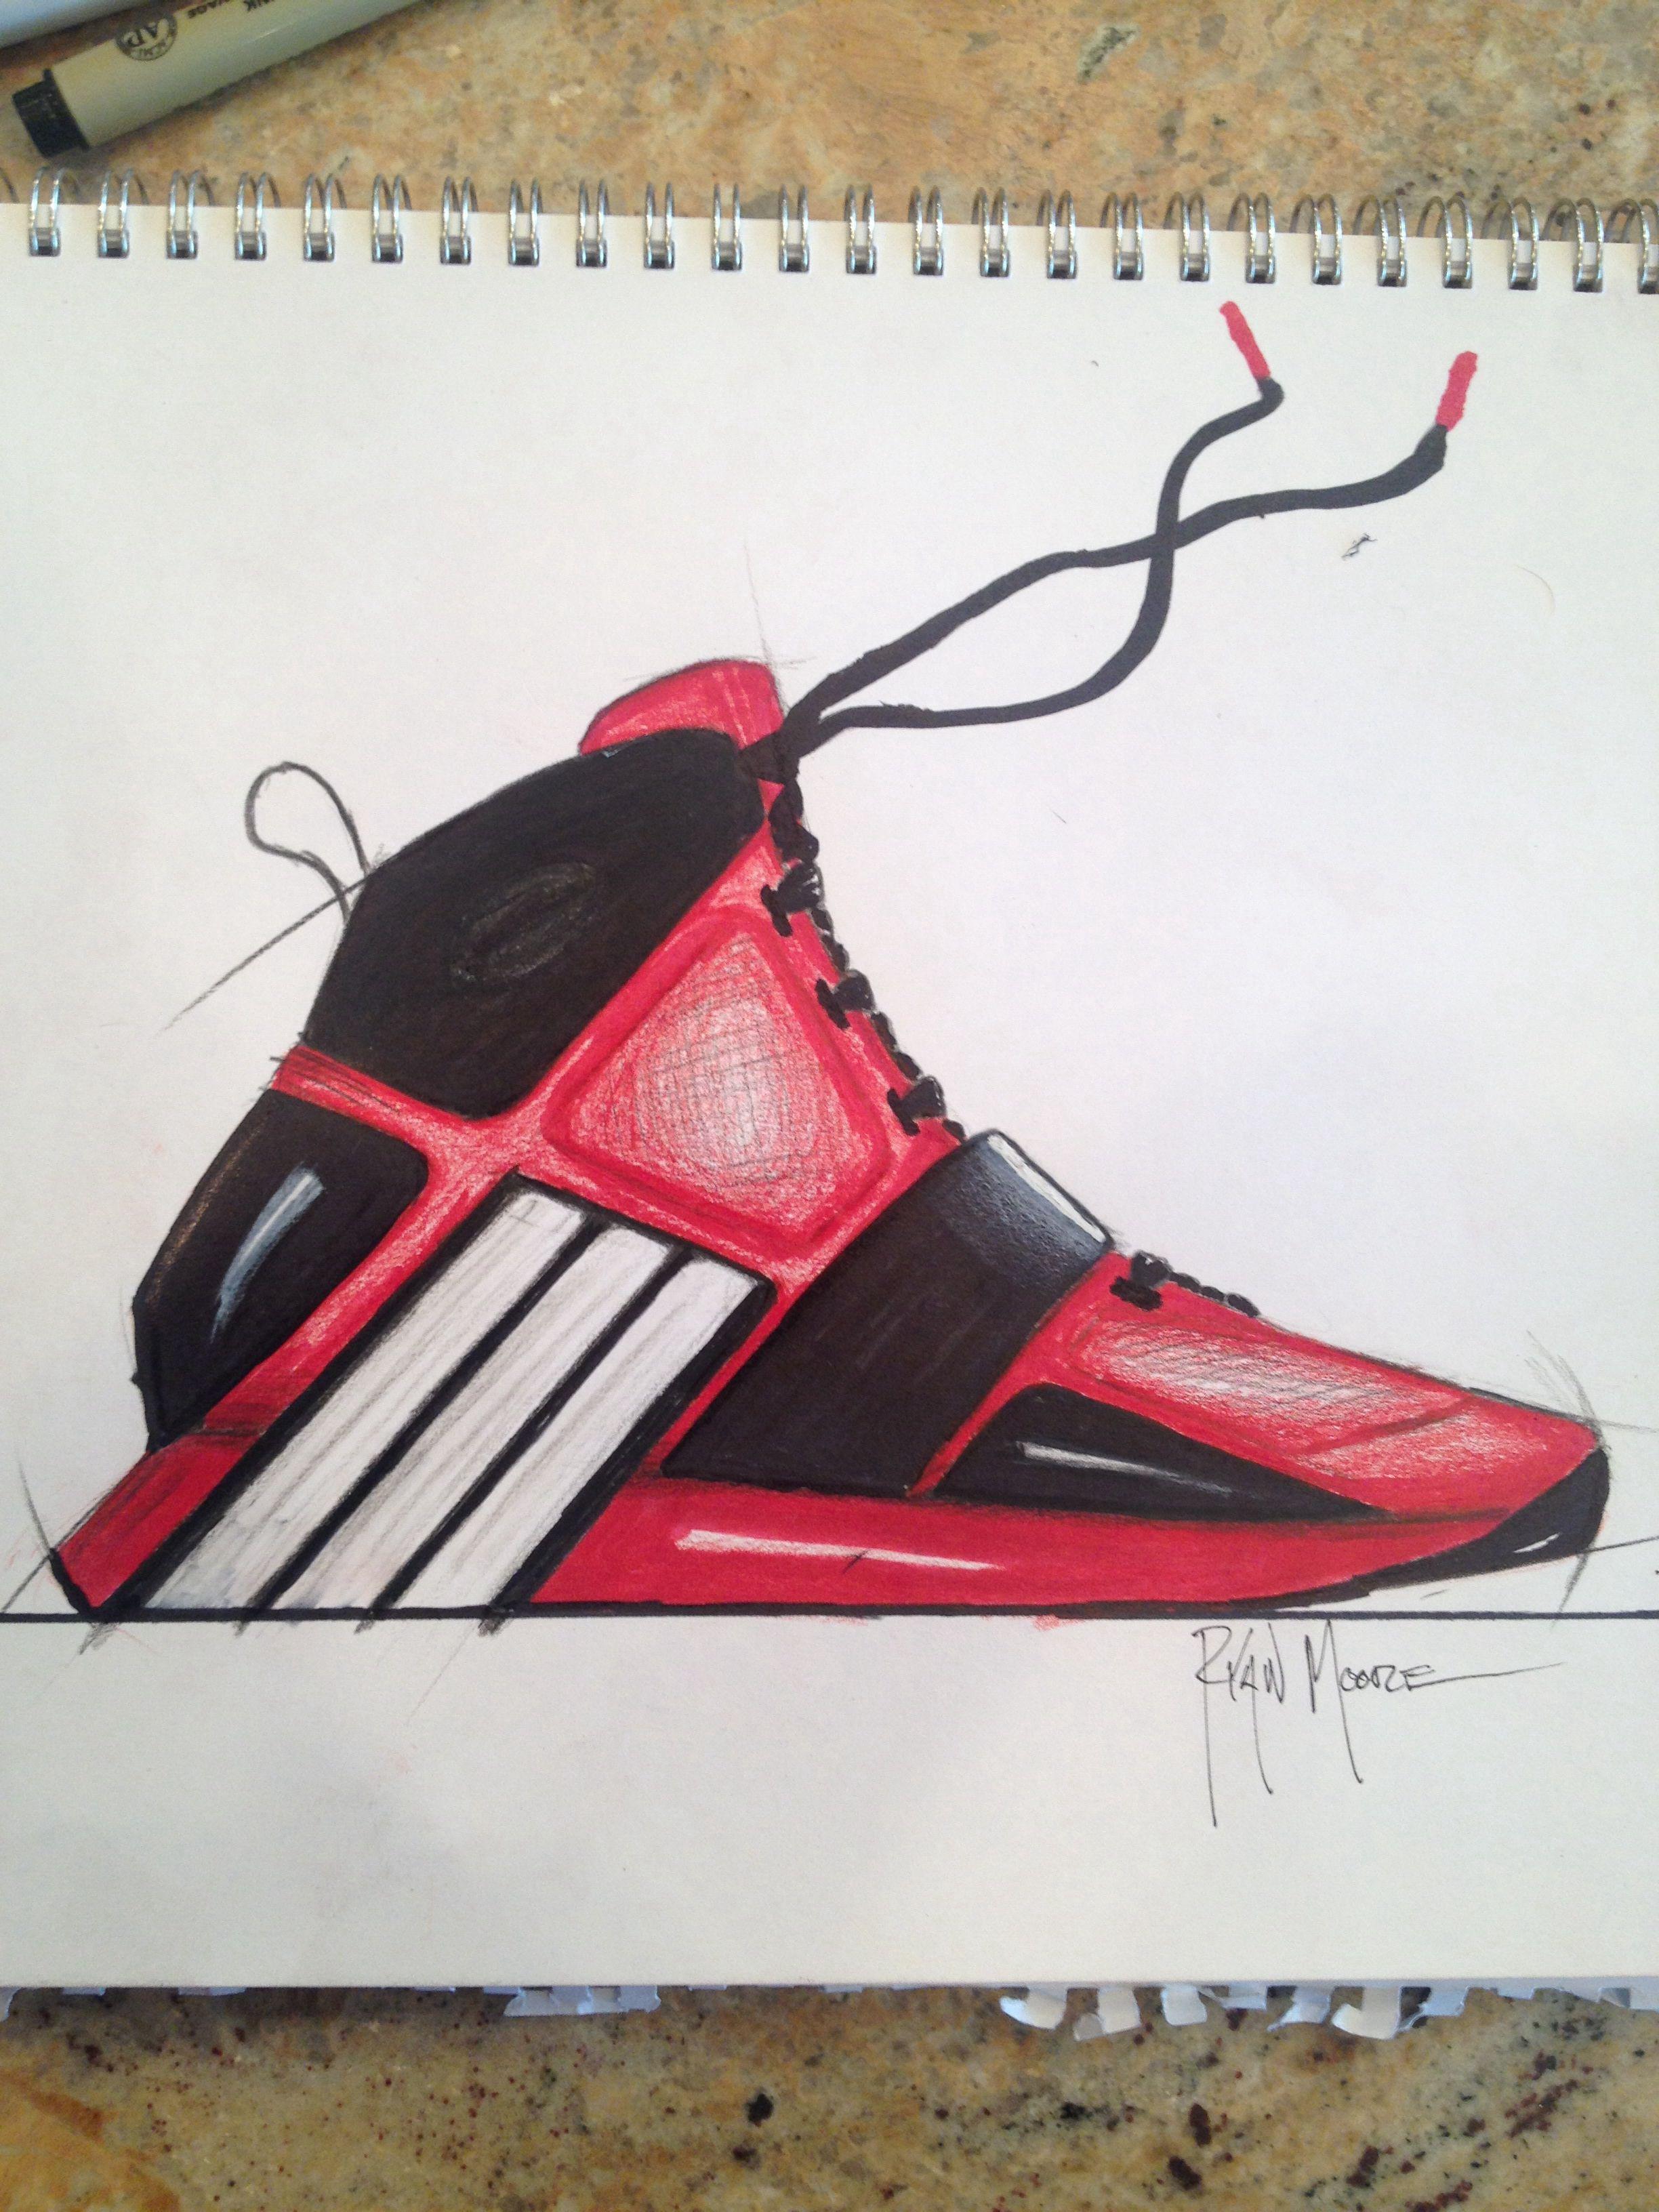 Adidas basketball shoe designed for Dwight Howard